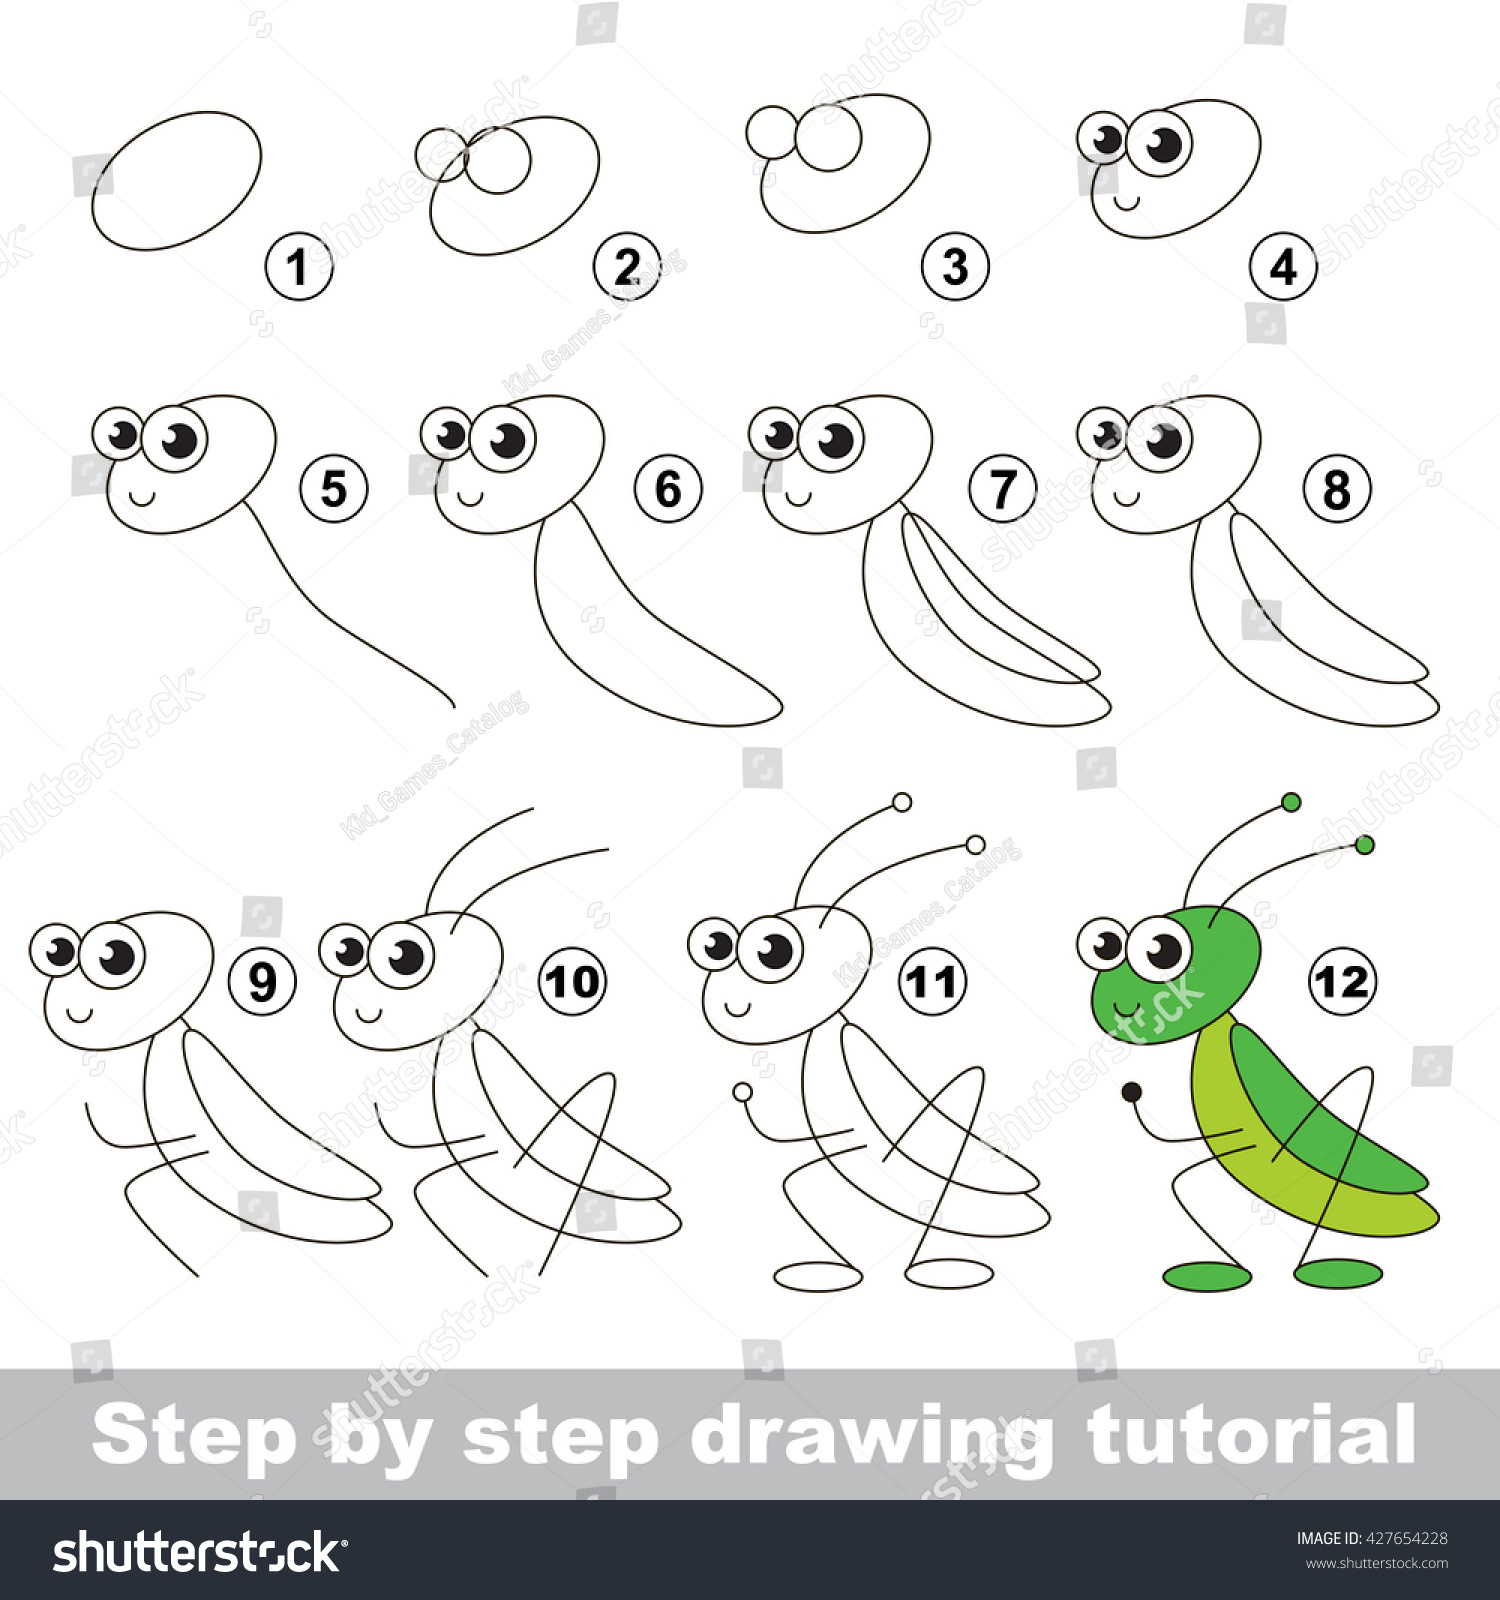 drawing tutorial children easy educational kid stock vector